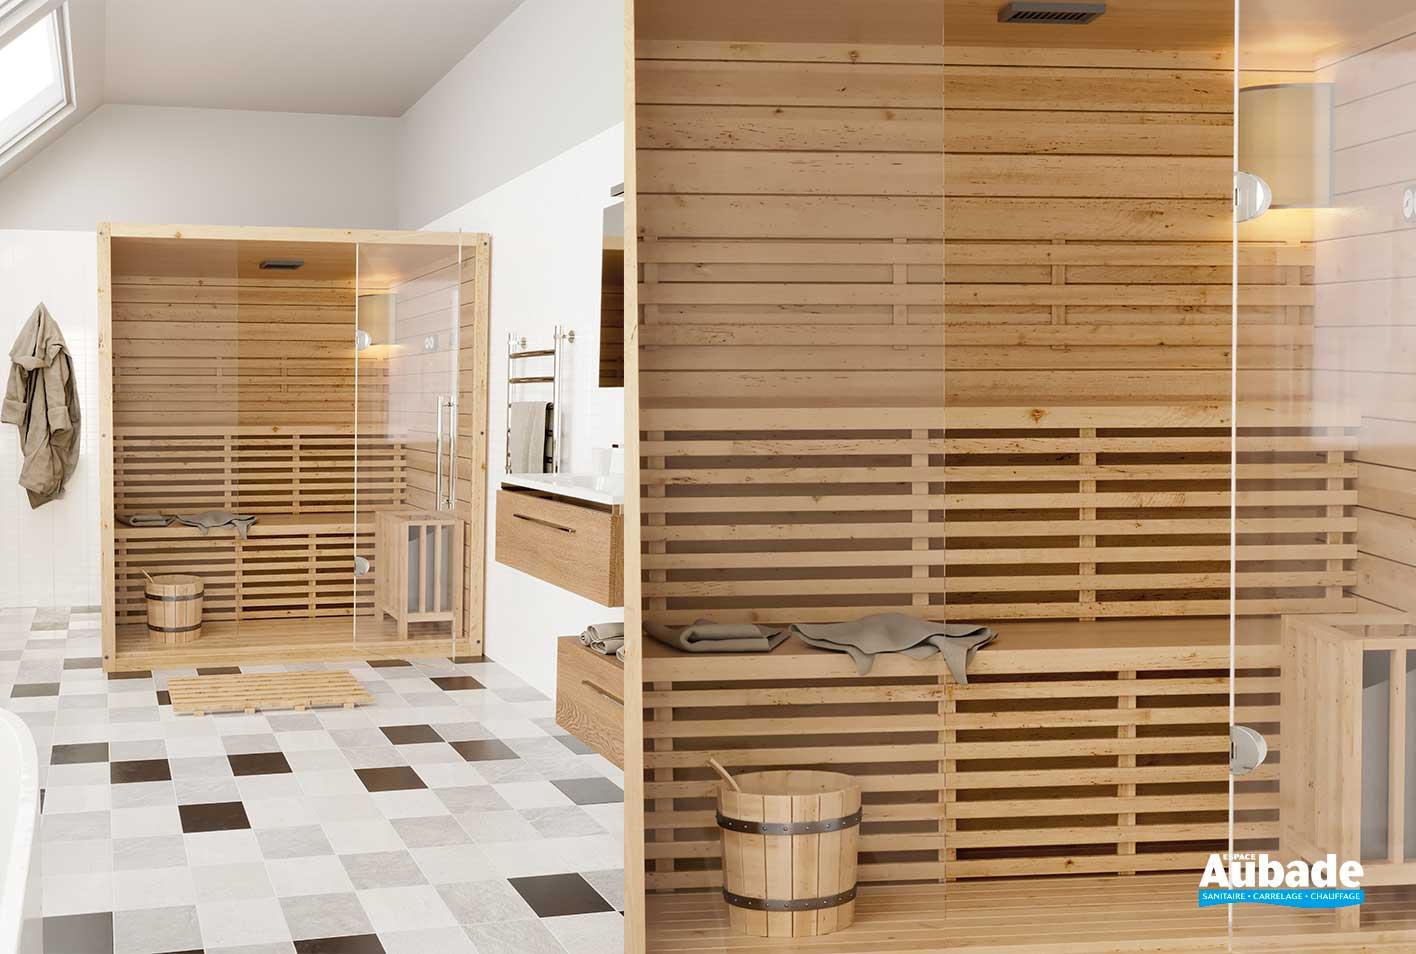 Comment Faire Fonctionner Un Sauna saunas & hammams québec de collin arredo